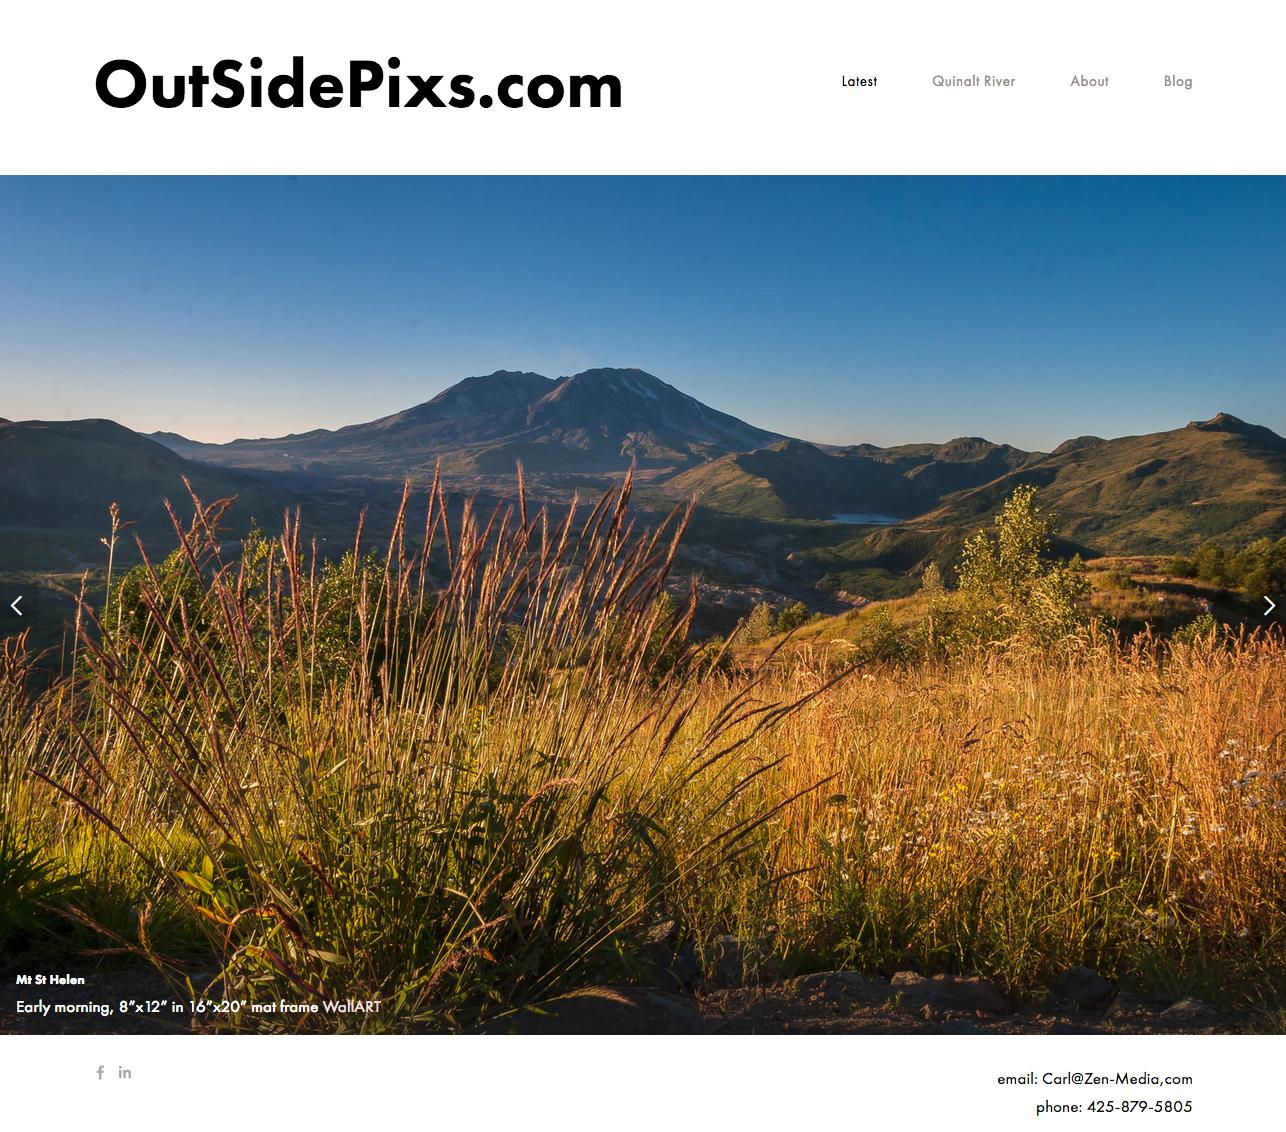 OutSidePixs.com